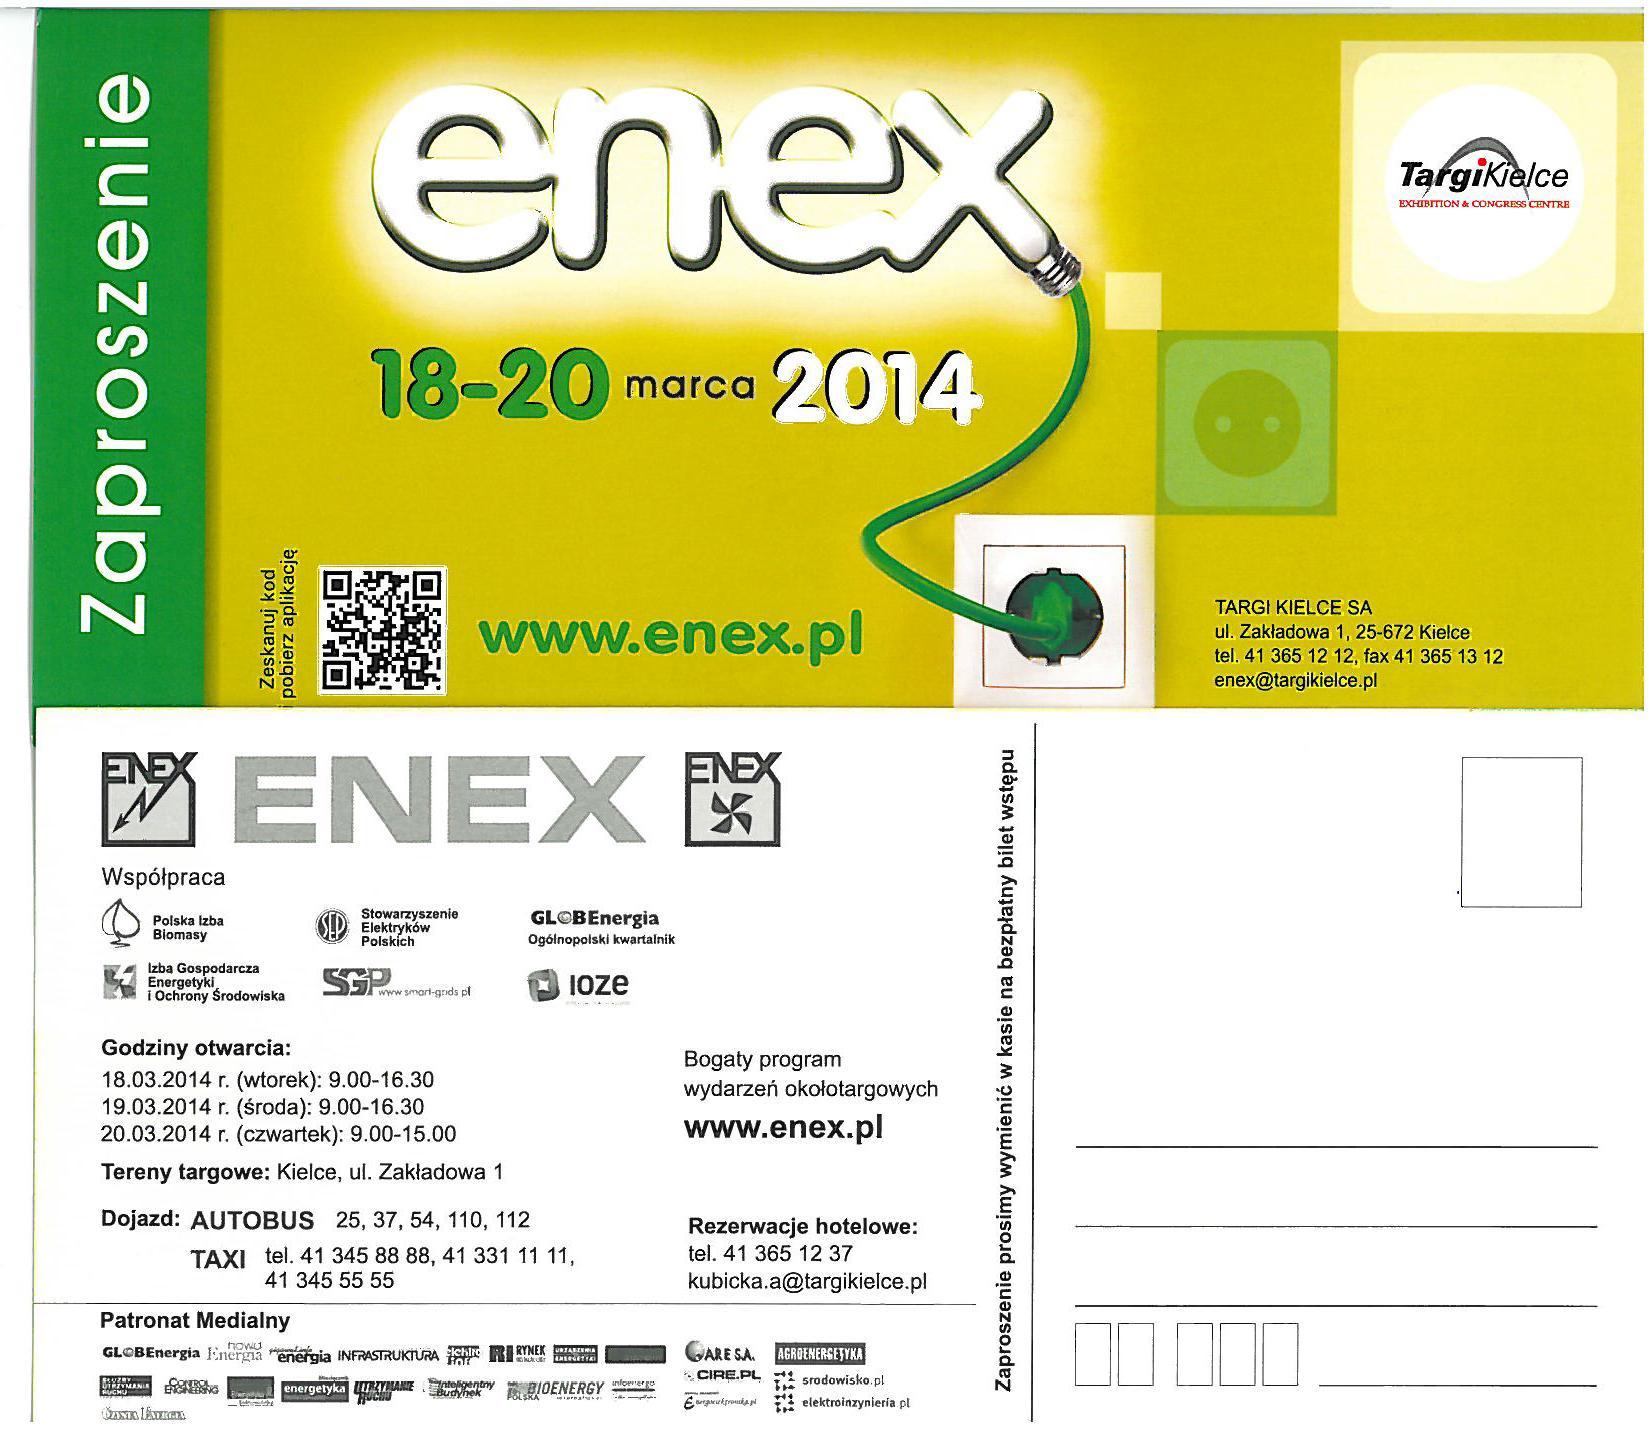 Enex 2014 zaproszenie